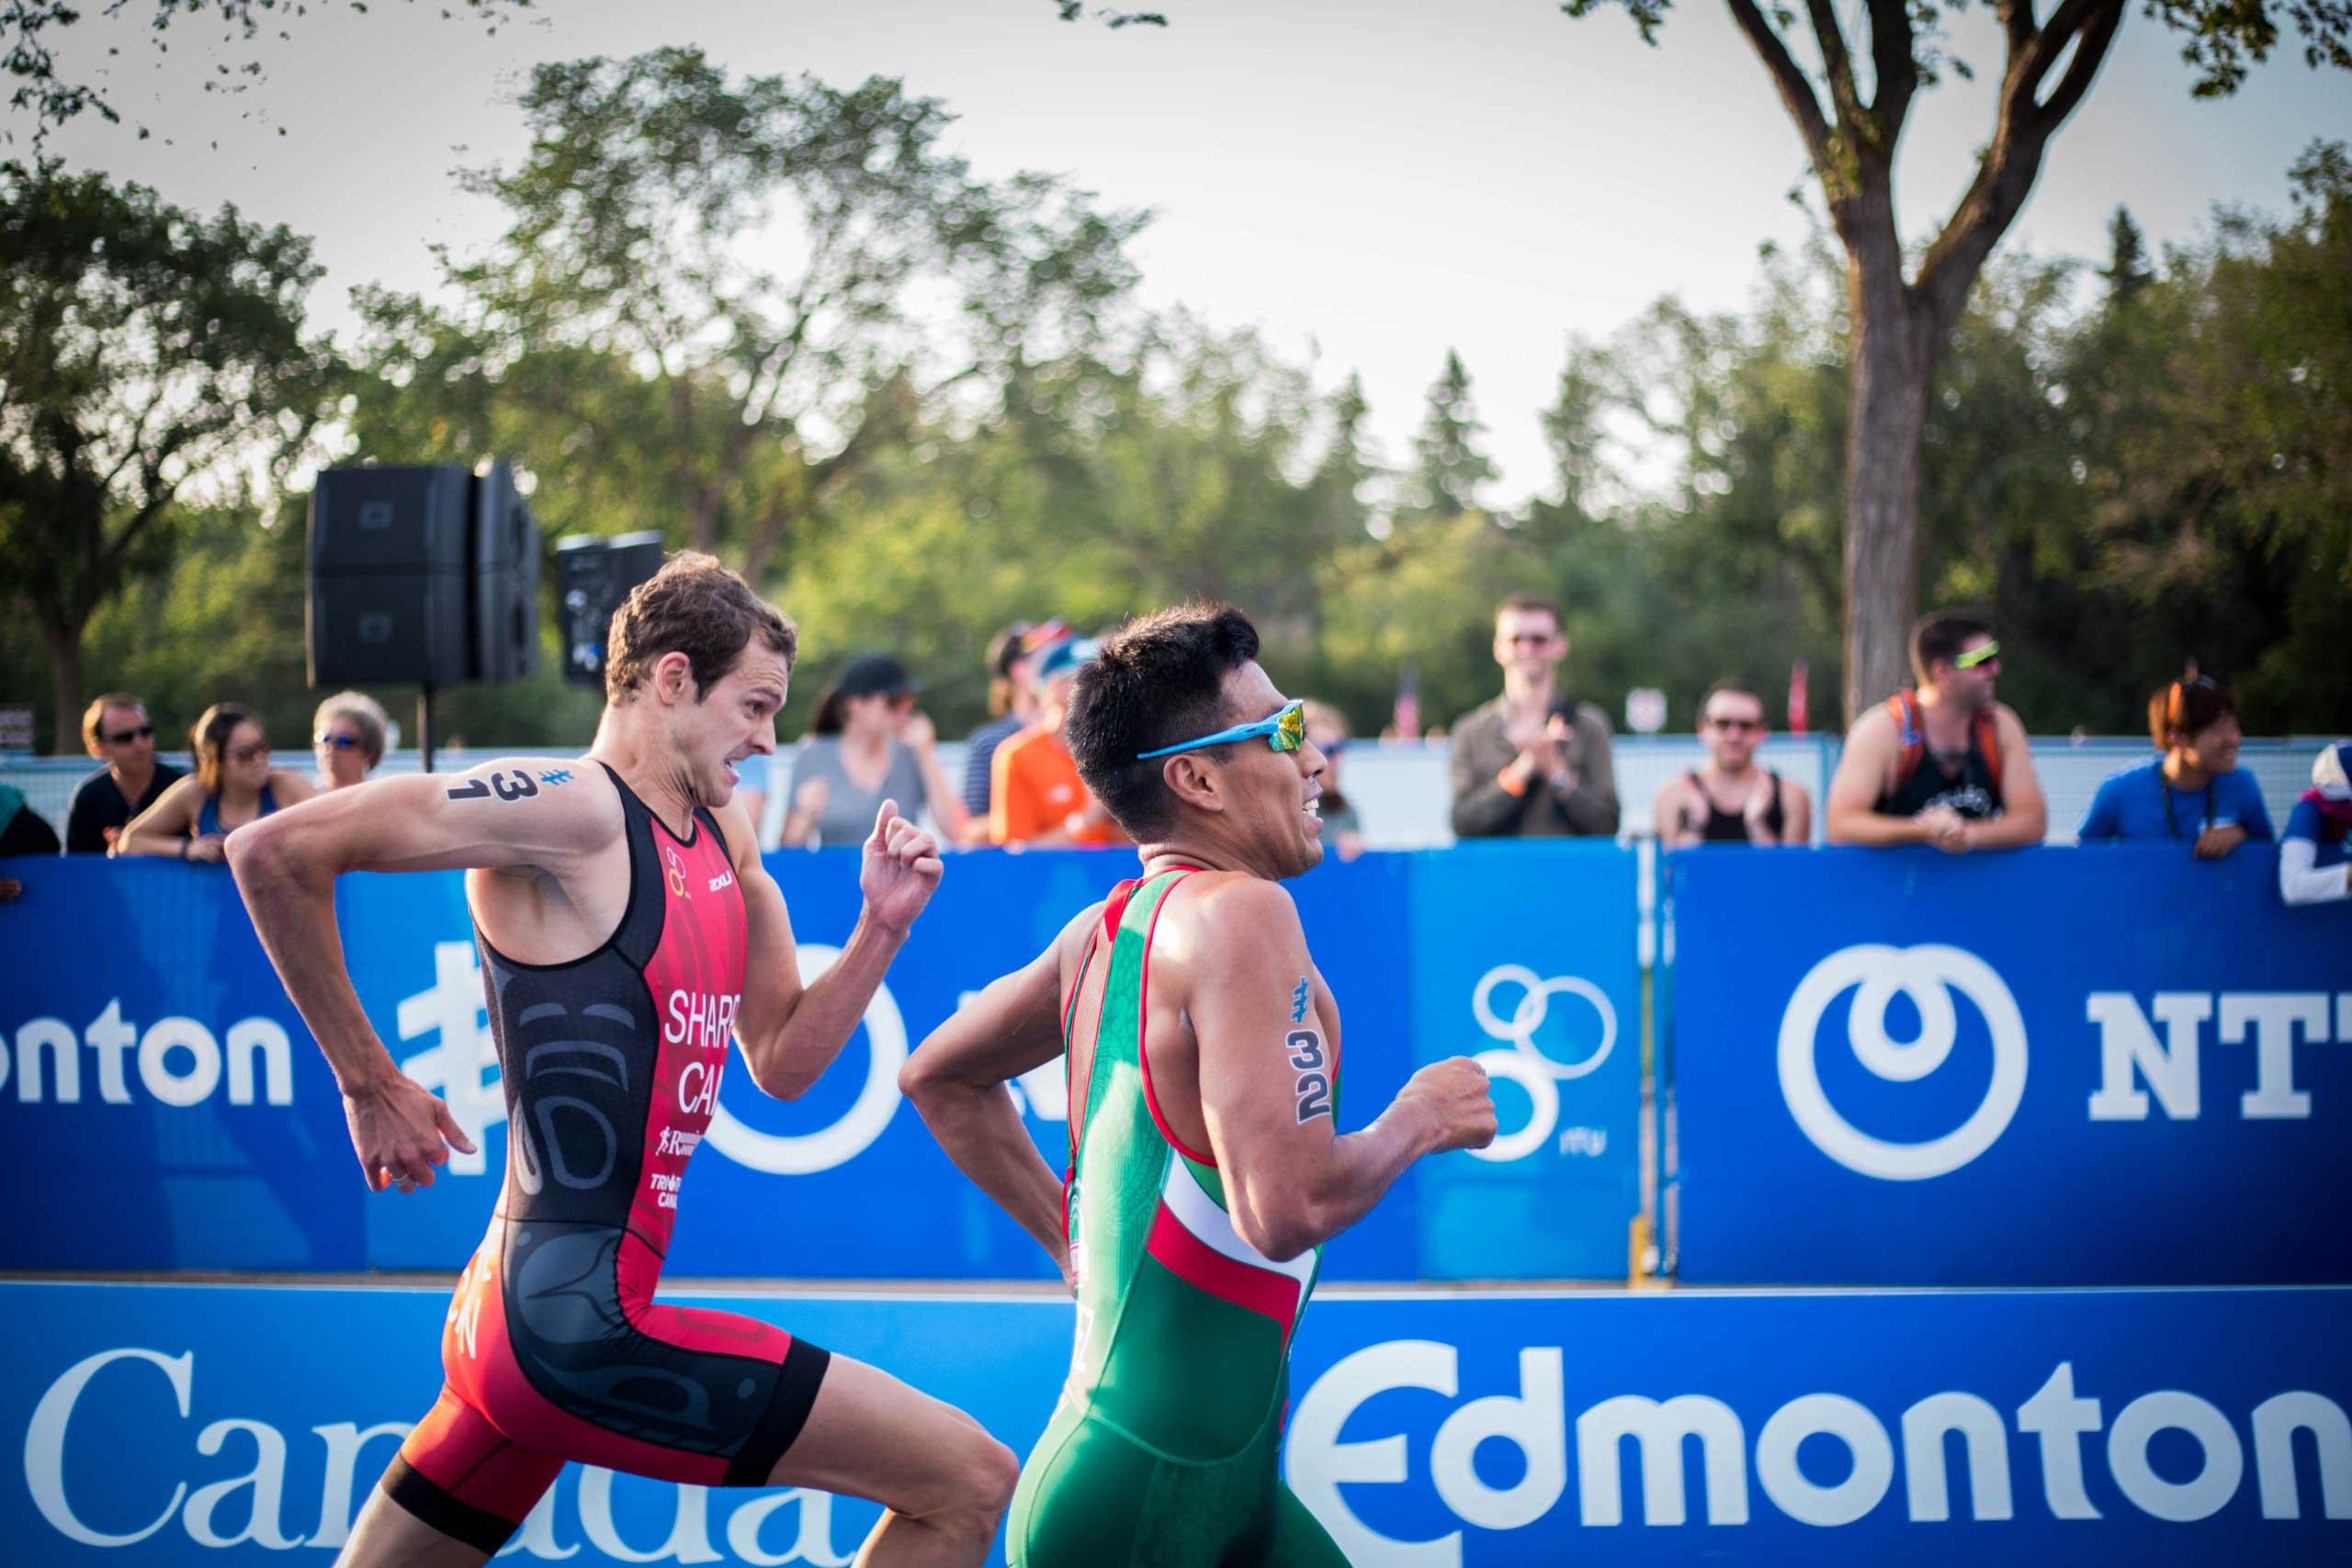 Two men running in a race